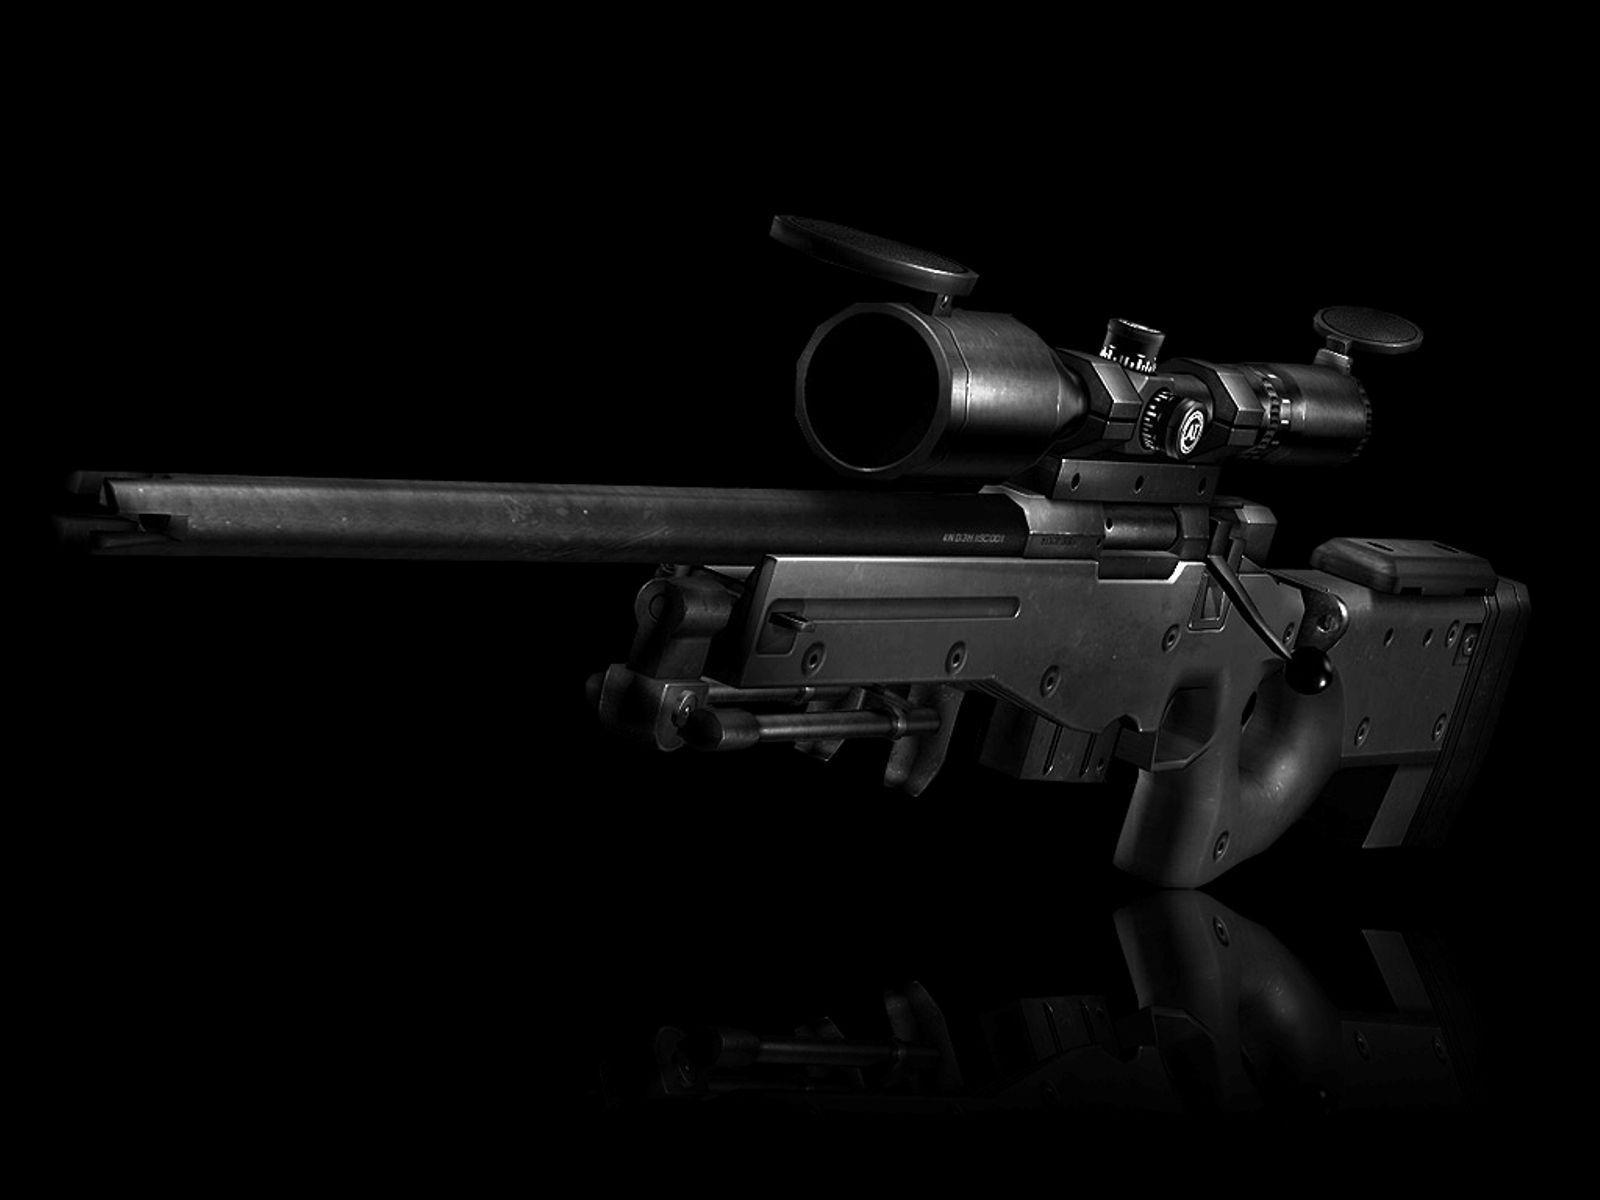 Sniper Rifle Wallpaper (73+ images) |Sniper Rifle Wallpaper